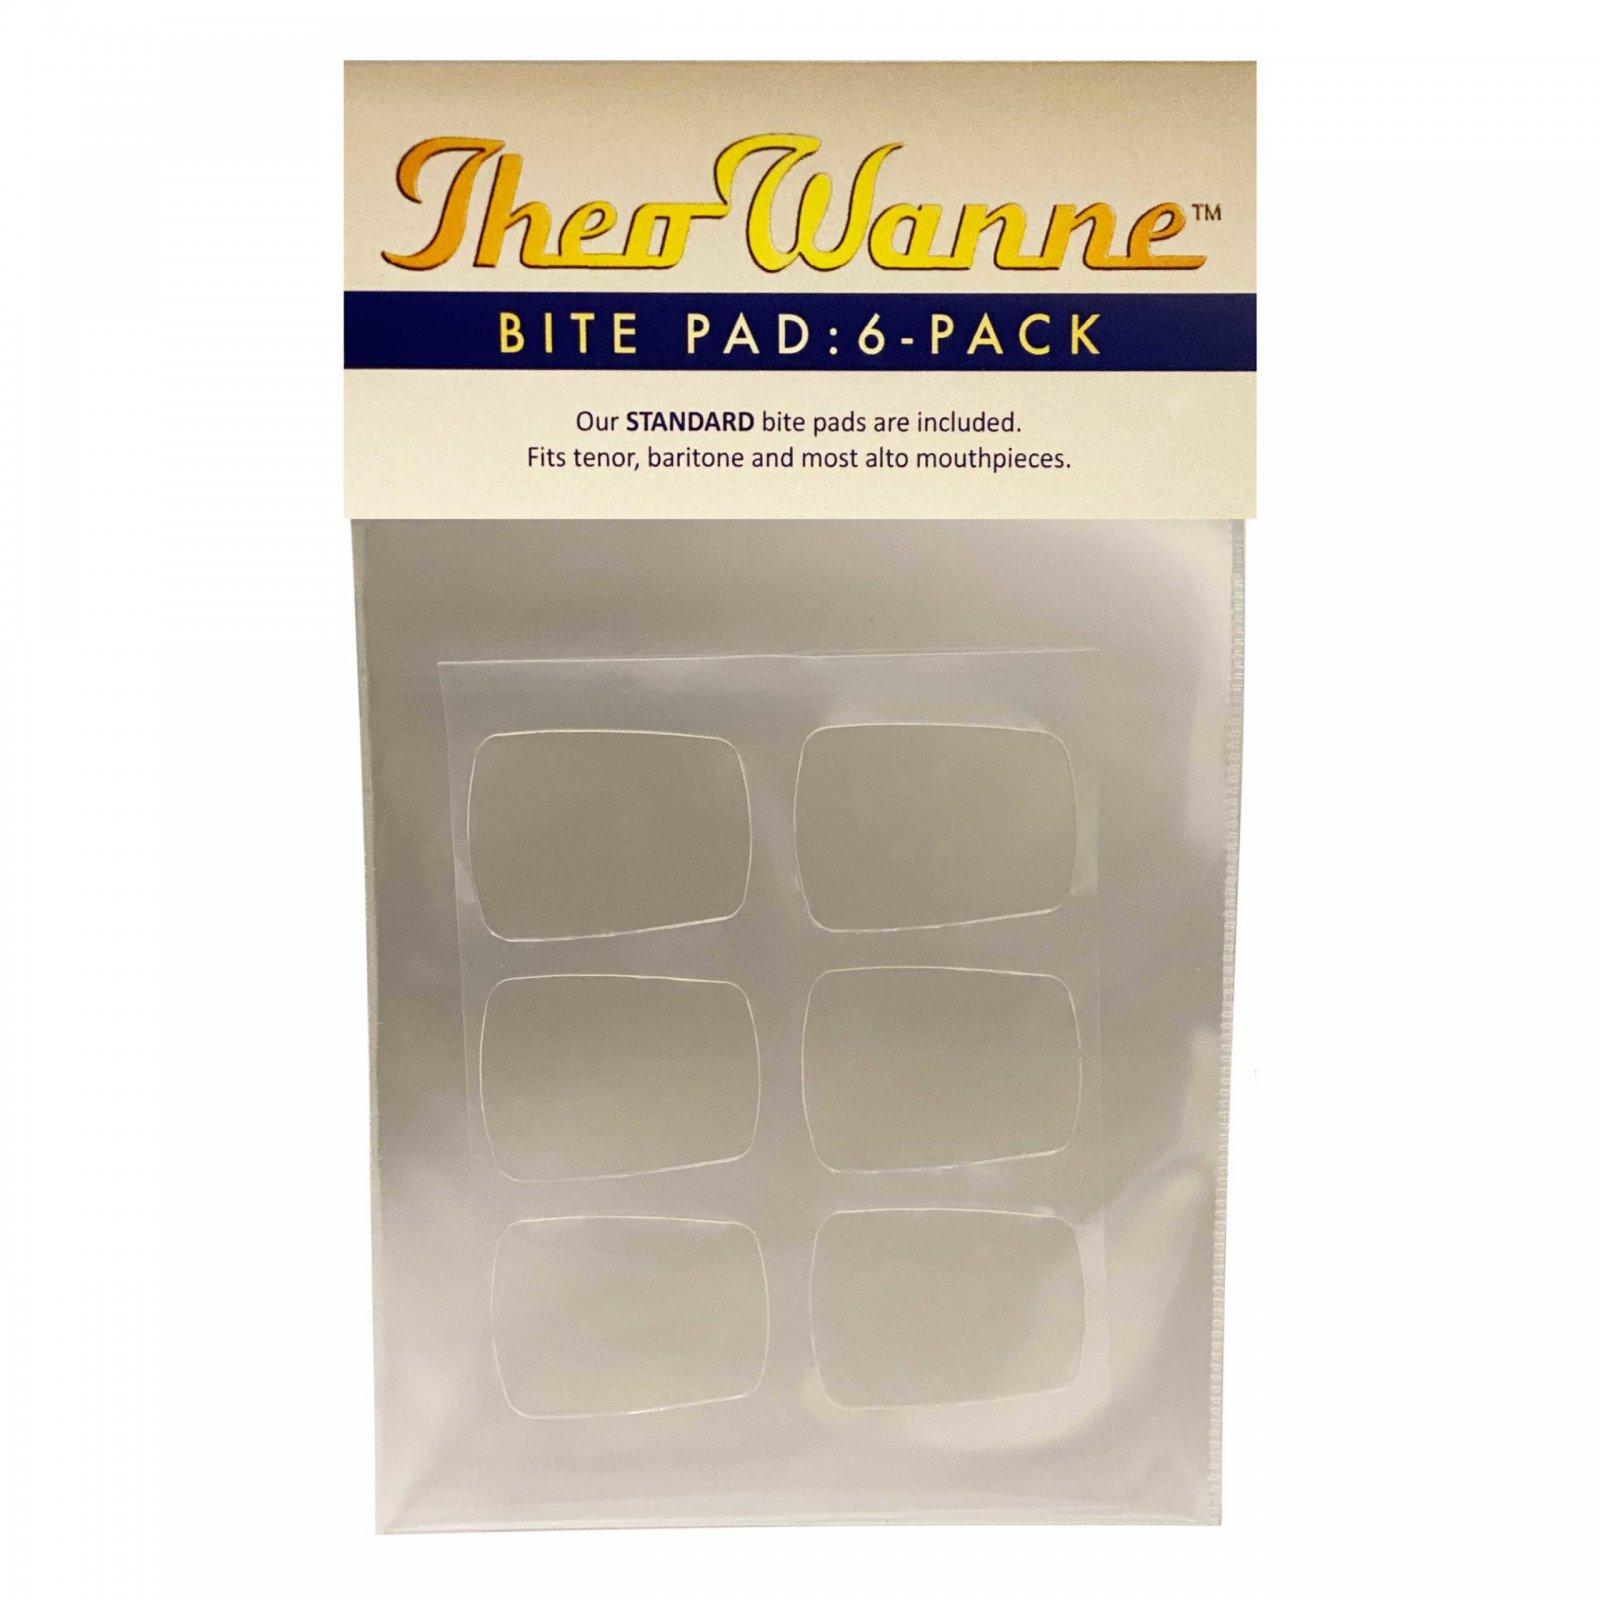 Theo Wanne Bite Pads